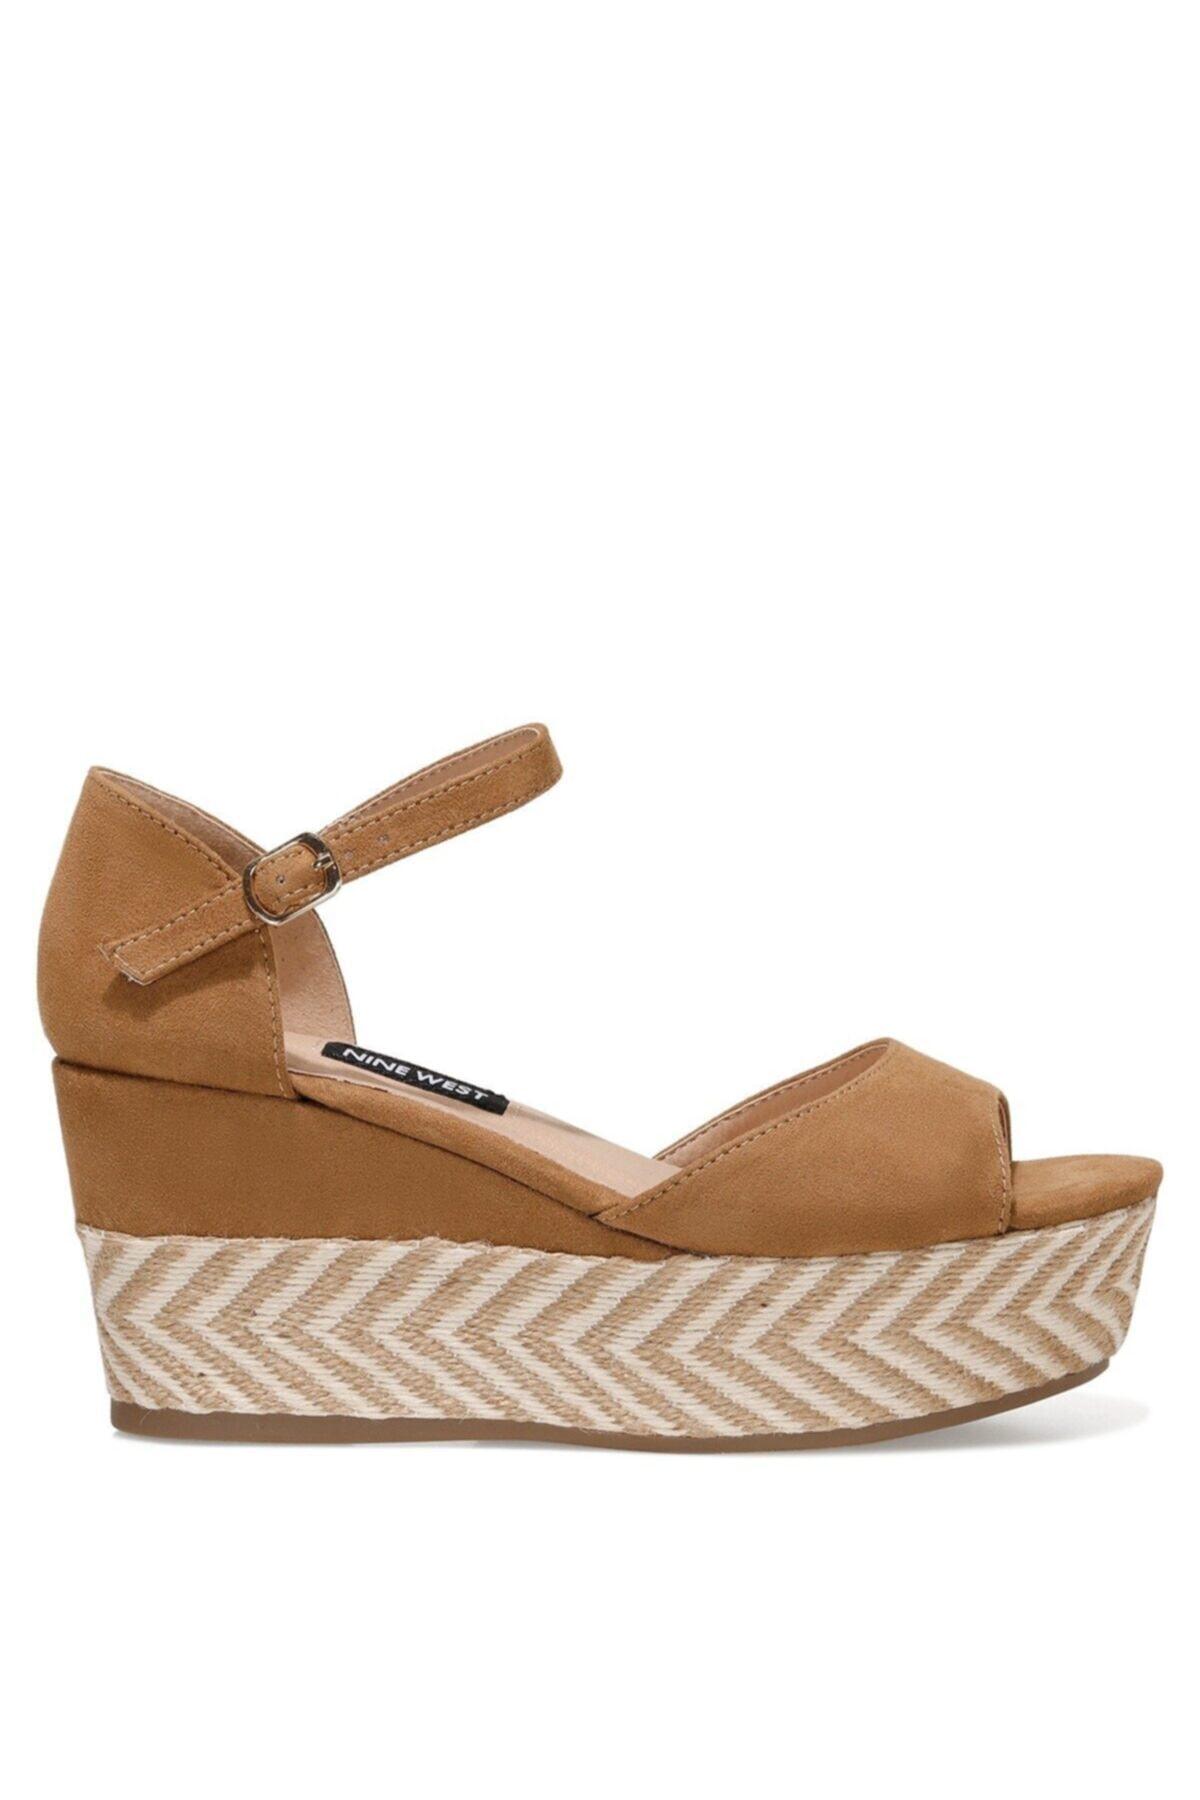 TRUDELL 1FX Camel Kadın Dolgu Topuklu Sandalet 101030545